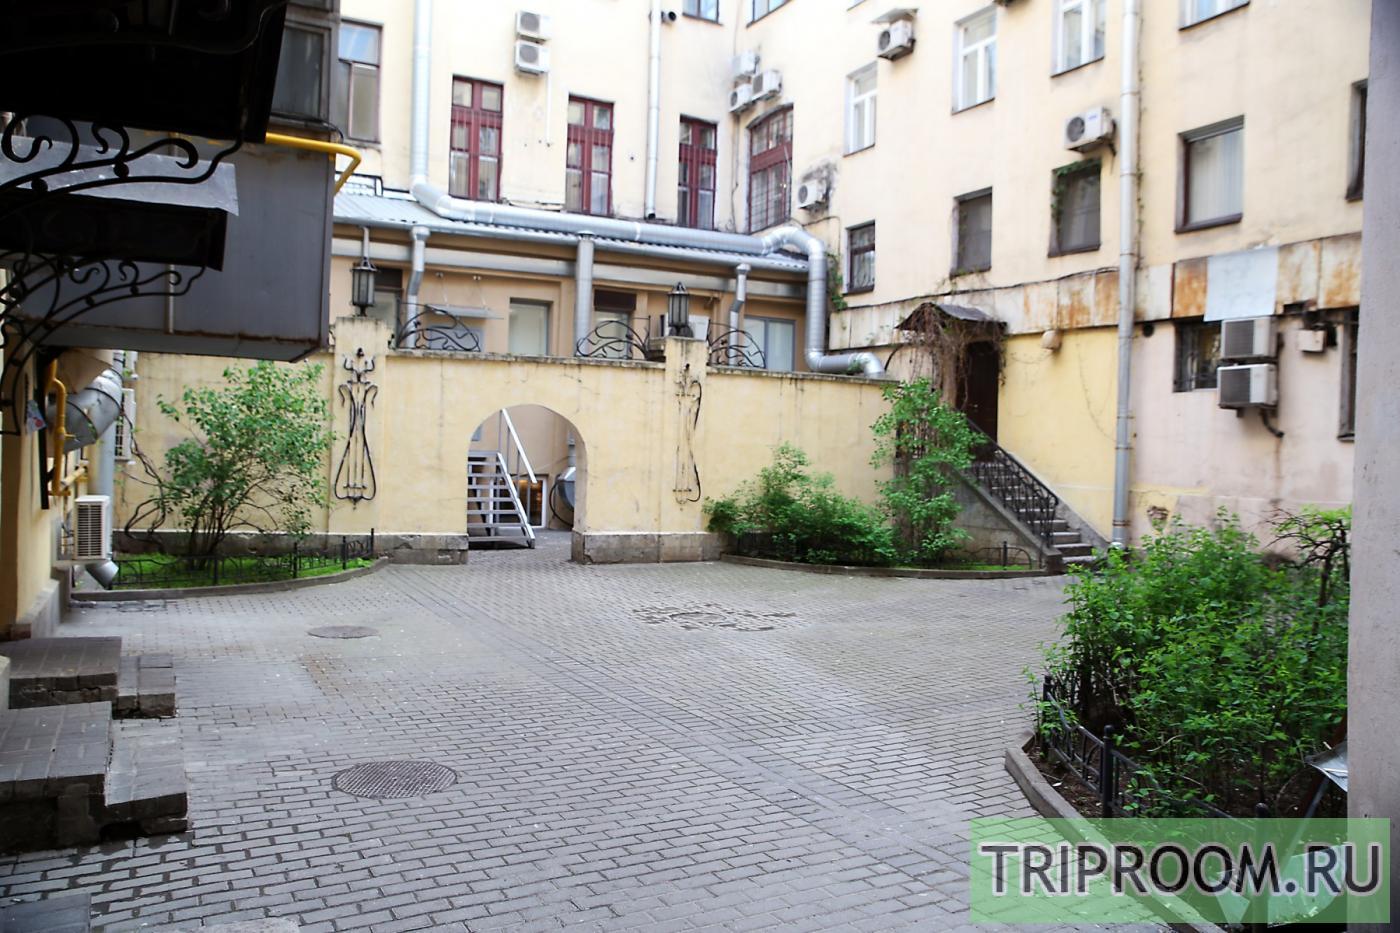 2-комнатная квартира посуточно (вариант № 20143), ул. Невский проспект, фото № 14